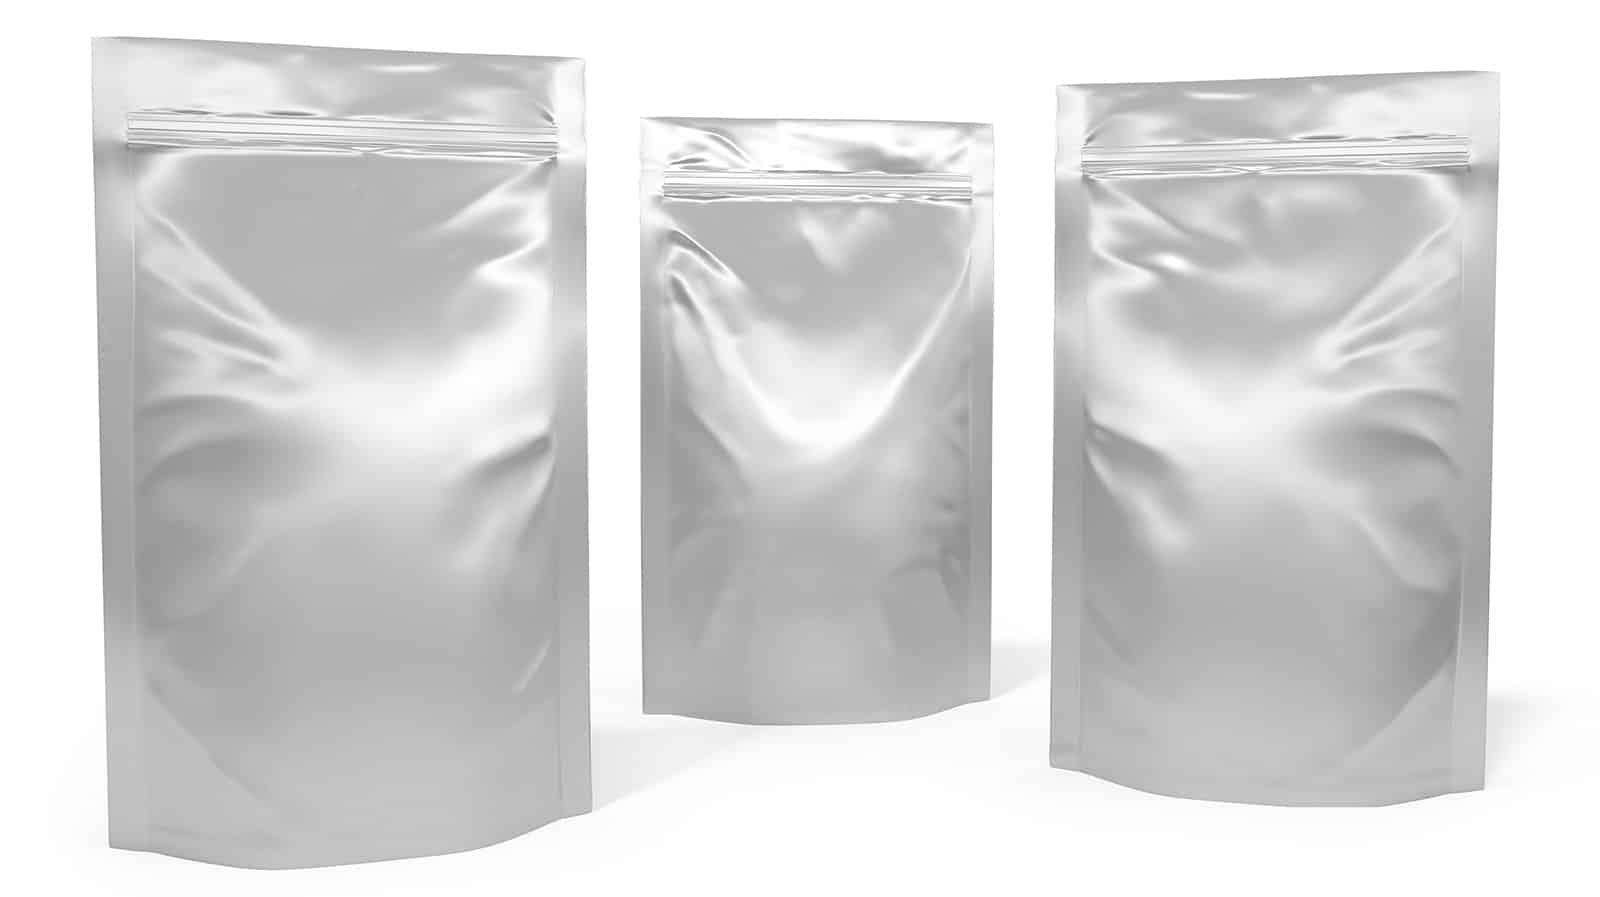 Multi Layered Plastic Packaging